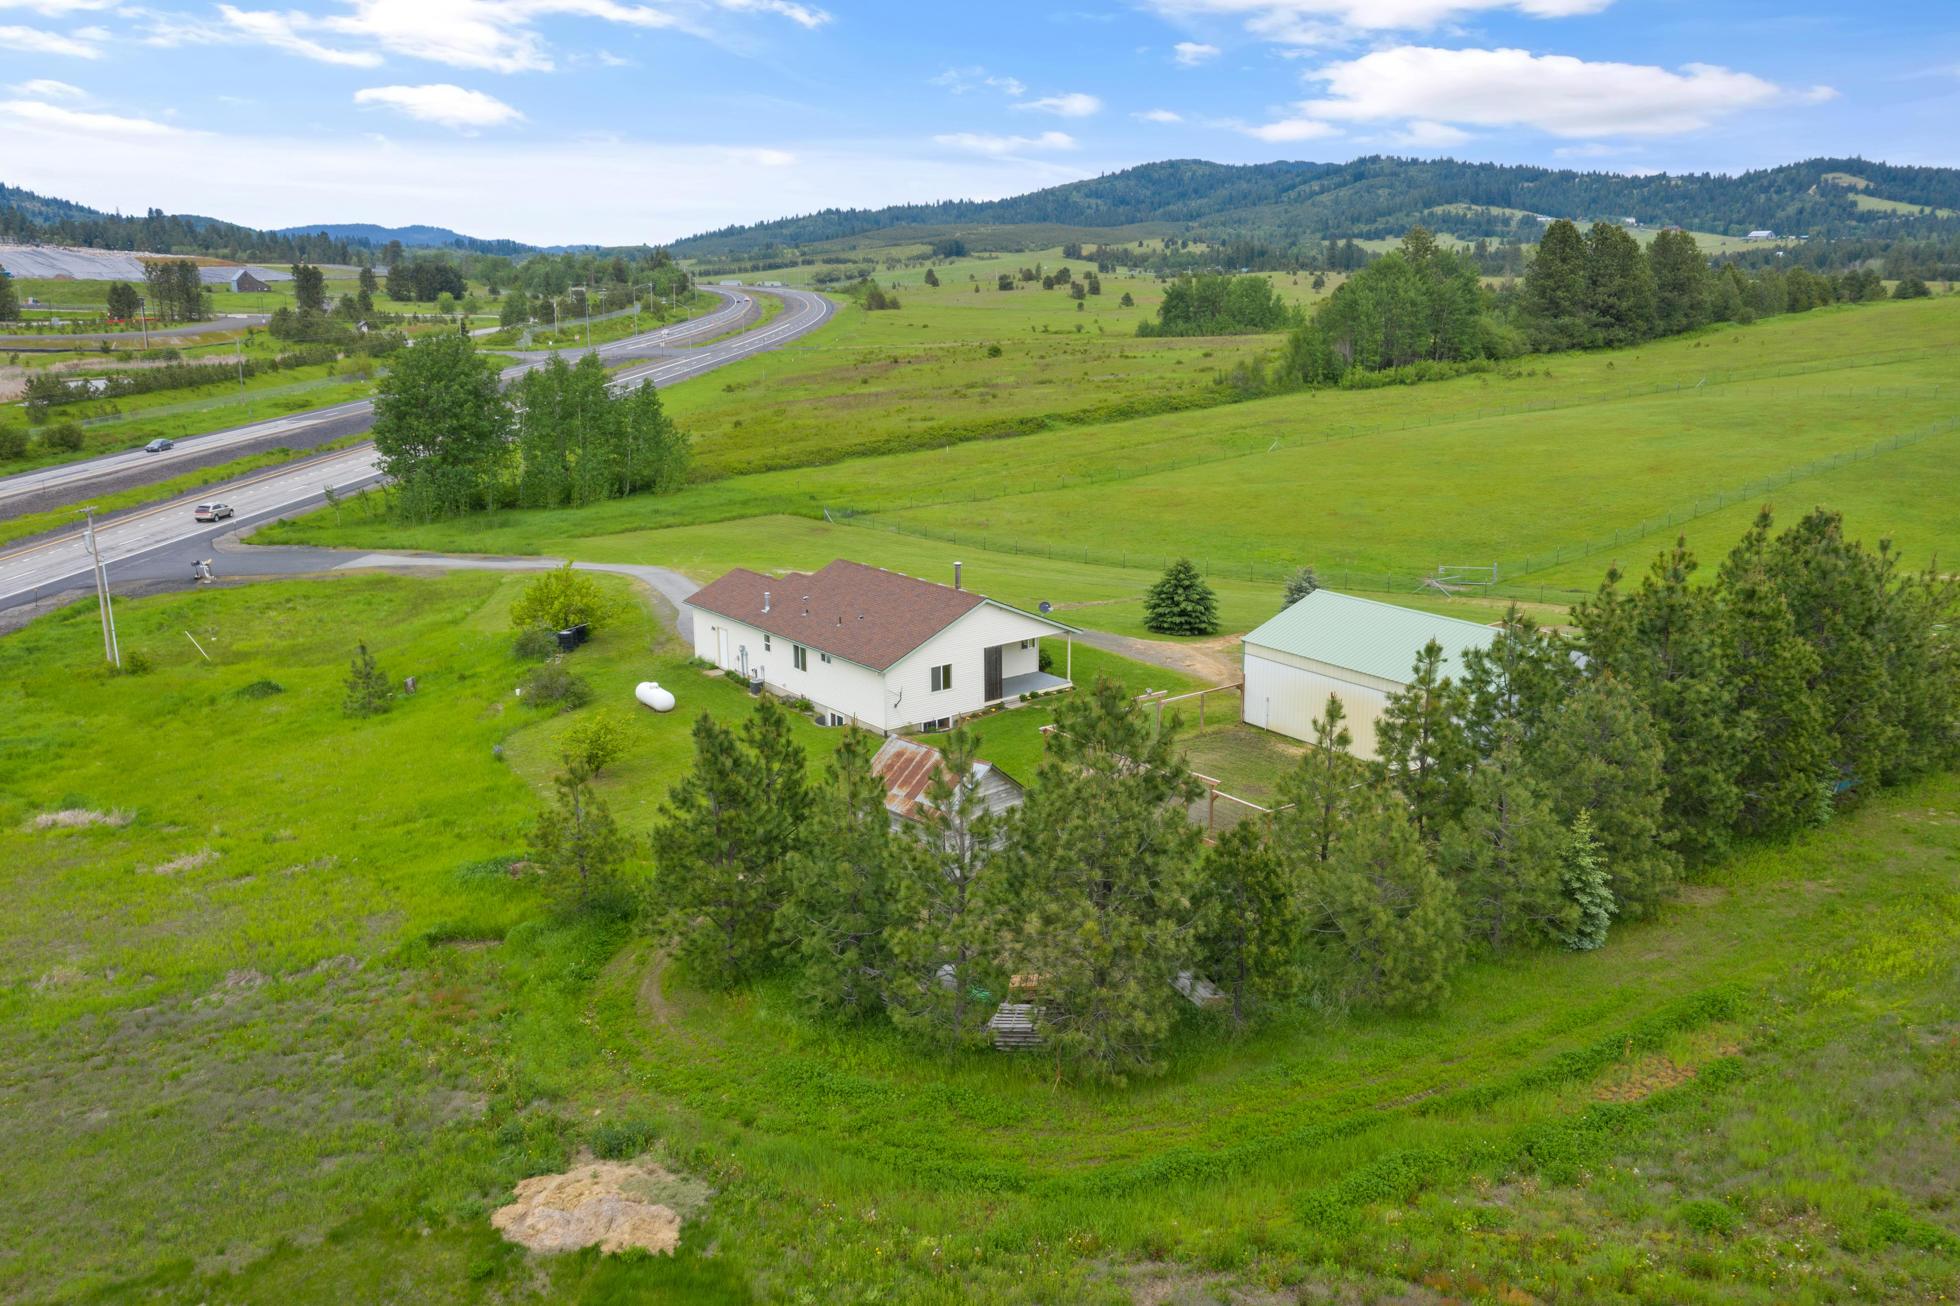 photo of 22538 S HIGHWAY 95 Coeur d'Alene Idaho 83814